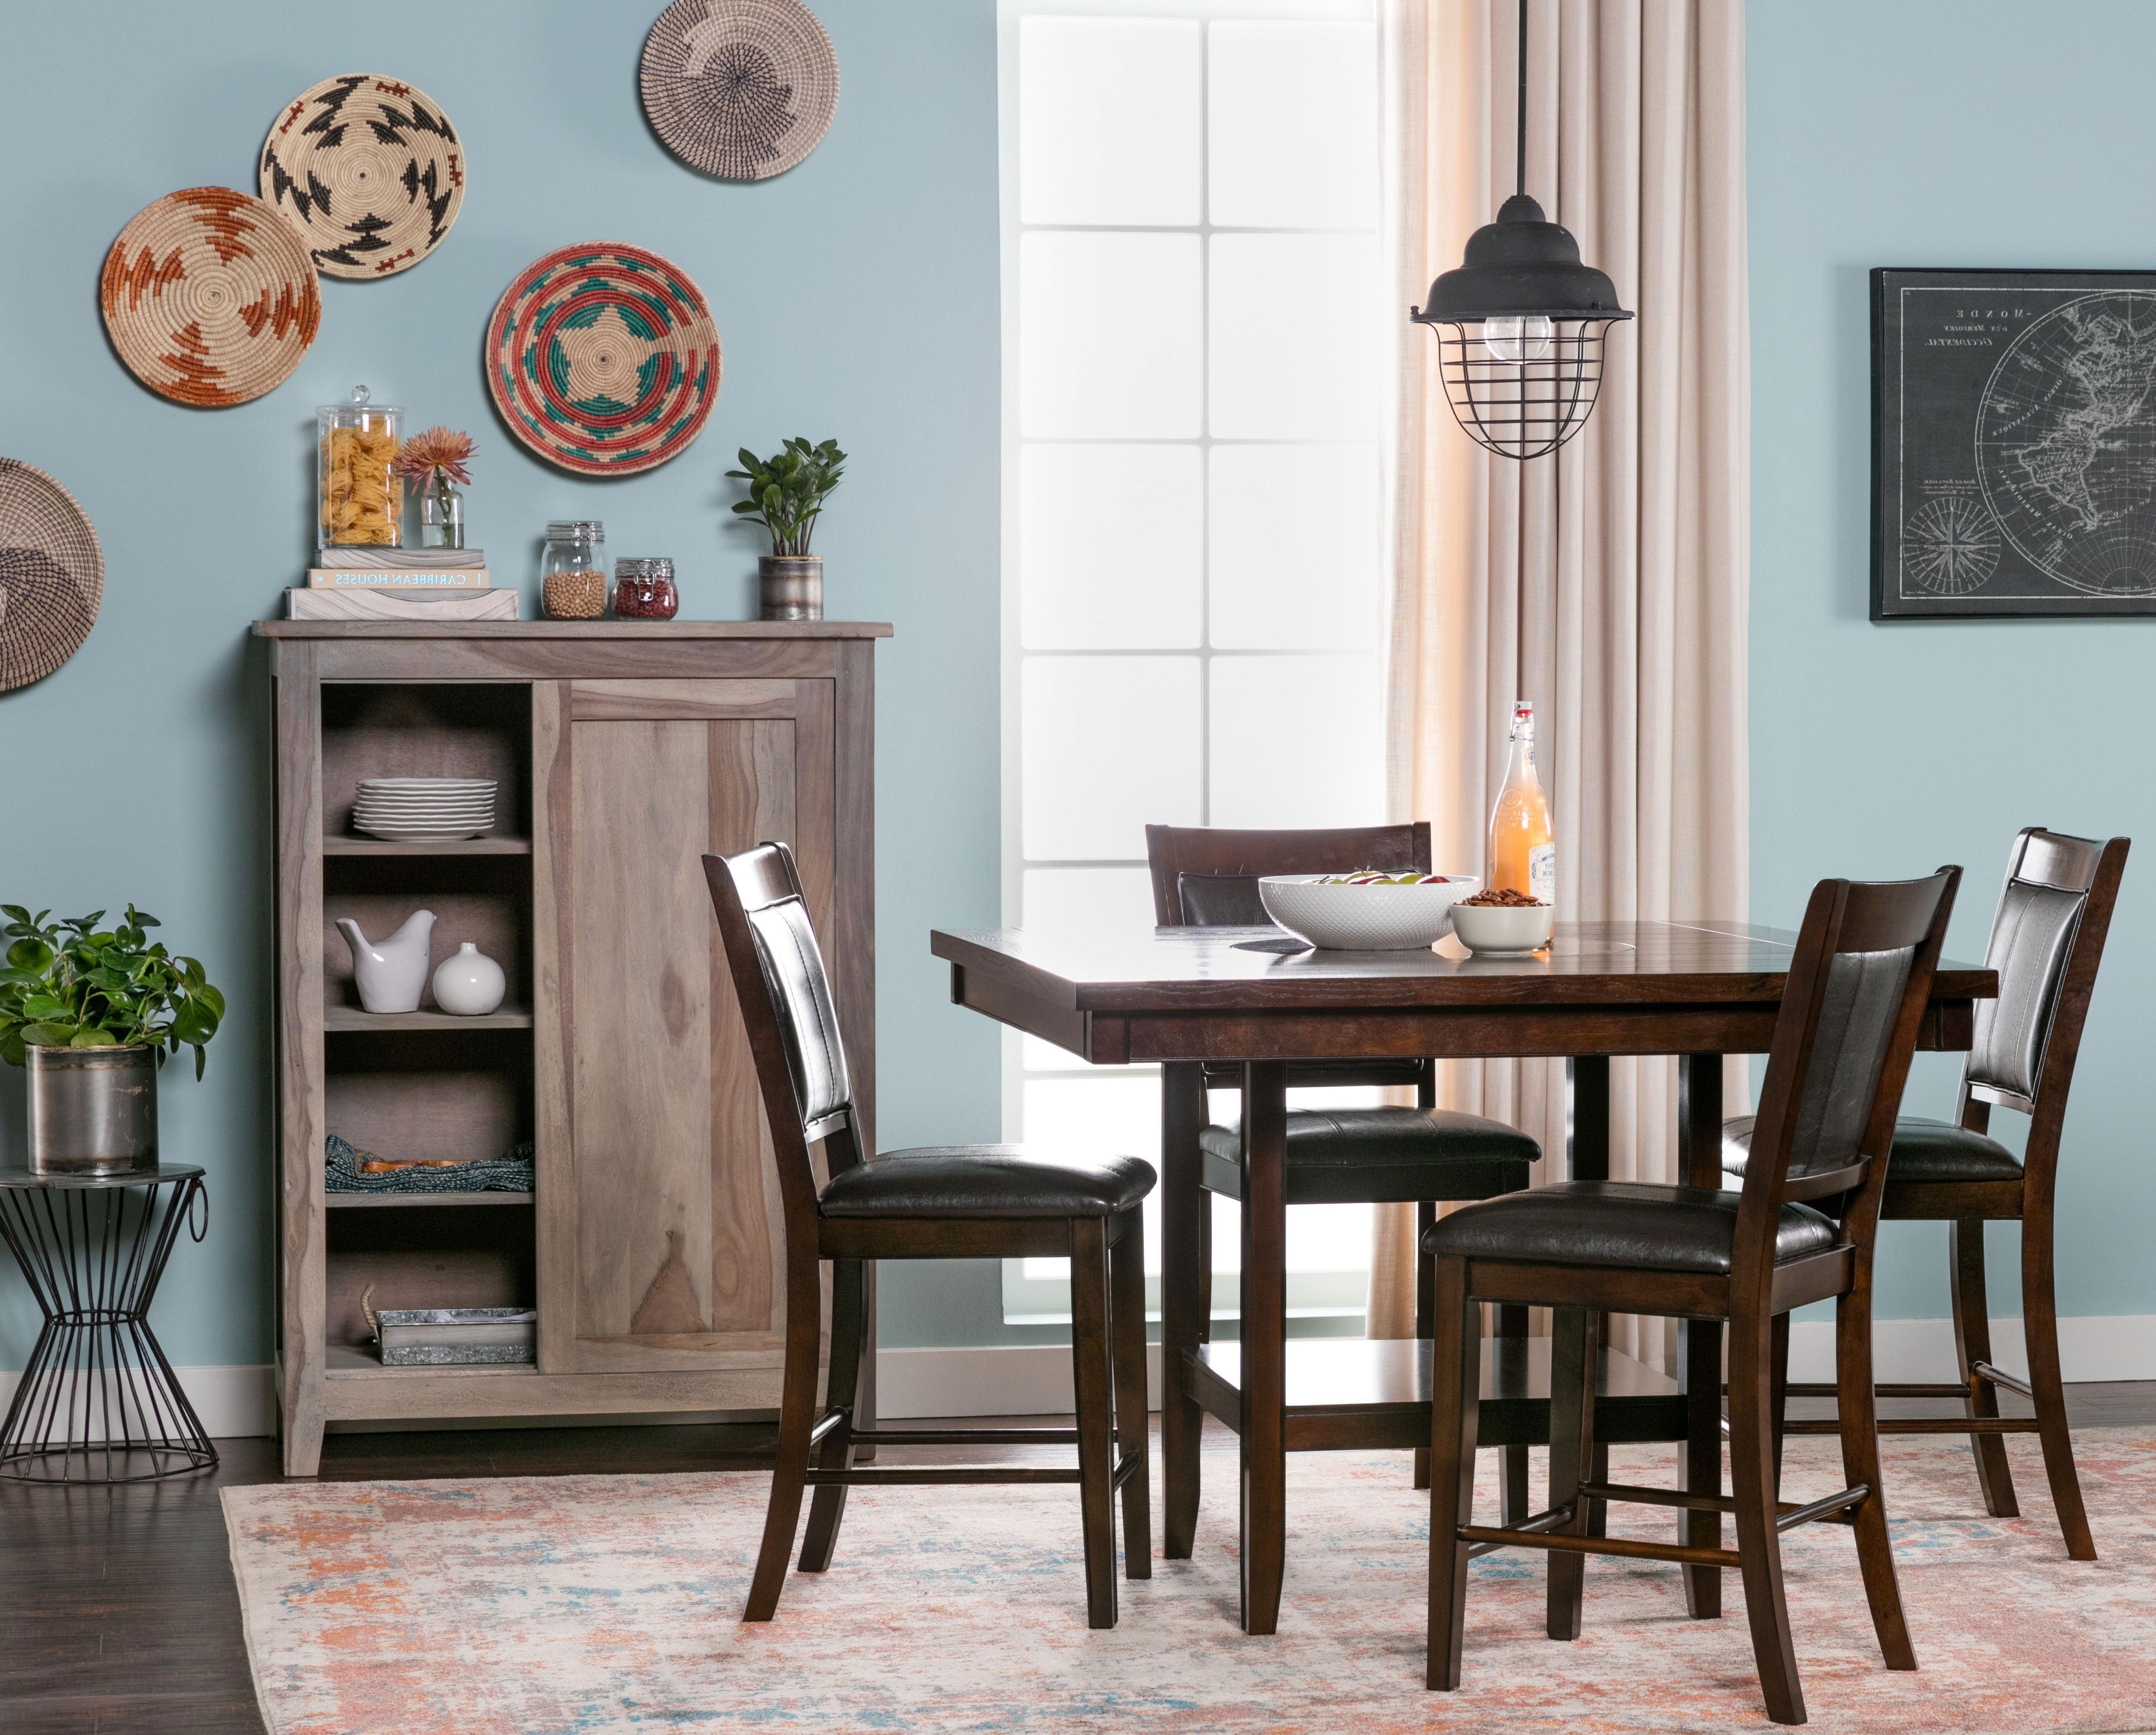 5 Piece Counter Set, Harper, Espresso, Kitchen & Dining Furniture In Most Recent Harper 5 Piece Counter Sets (View 8 of 25)